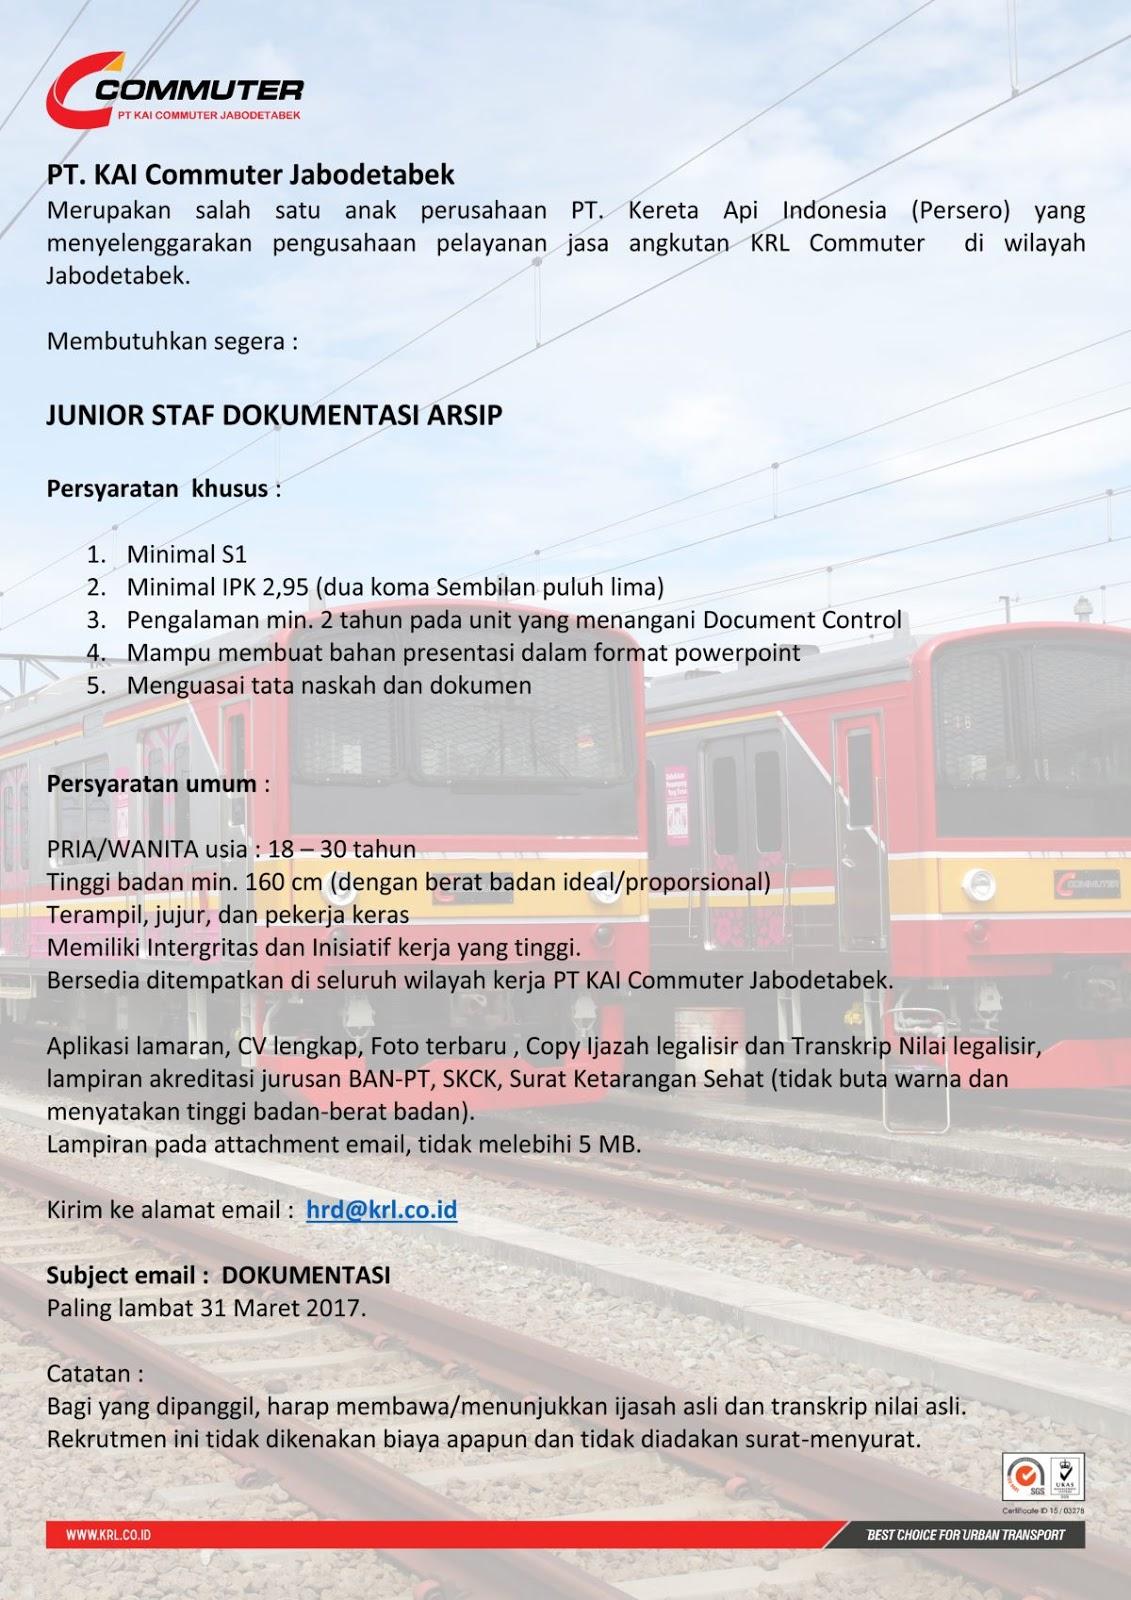 lokr pt kai commuter jabodetabel junior staff dokumentsi arsip 2017